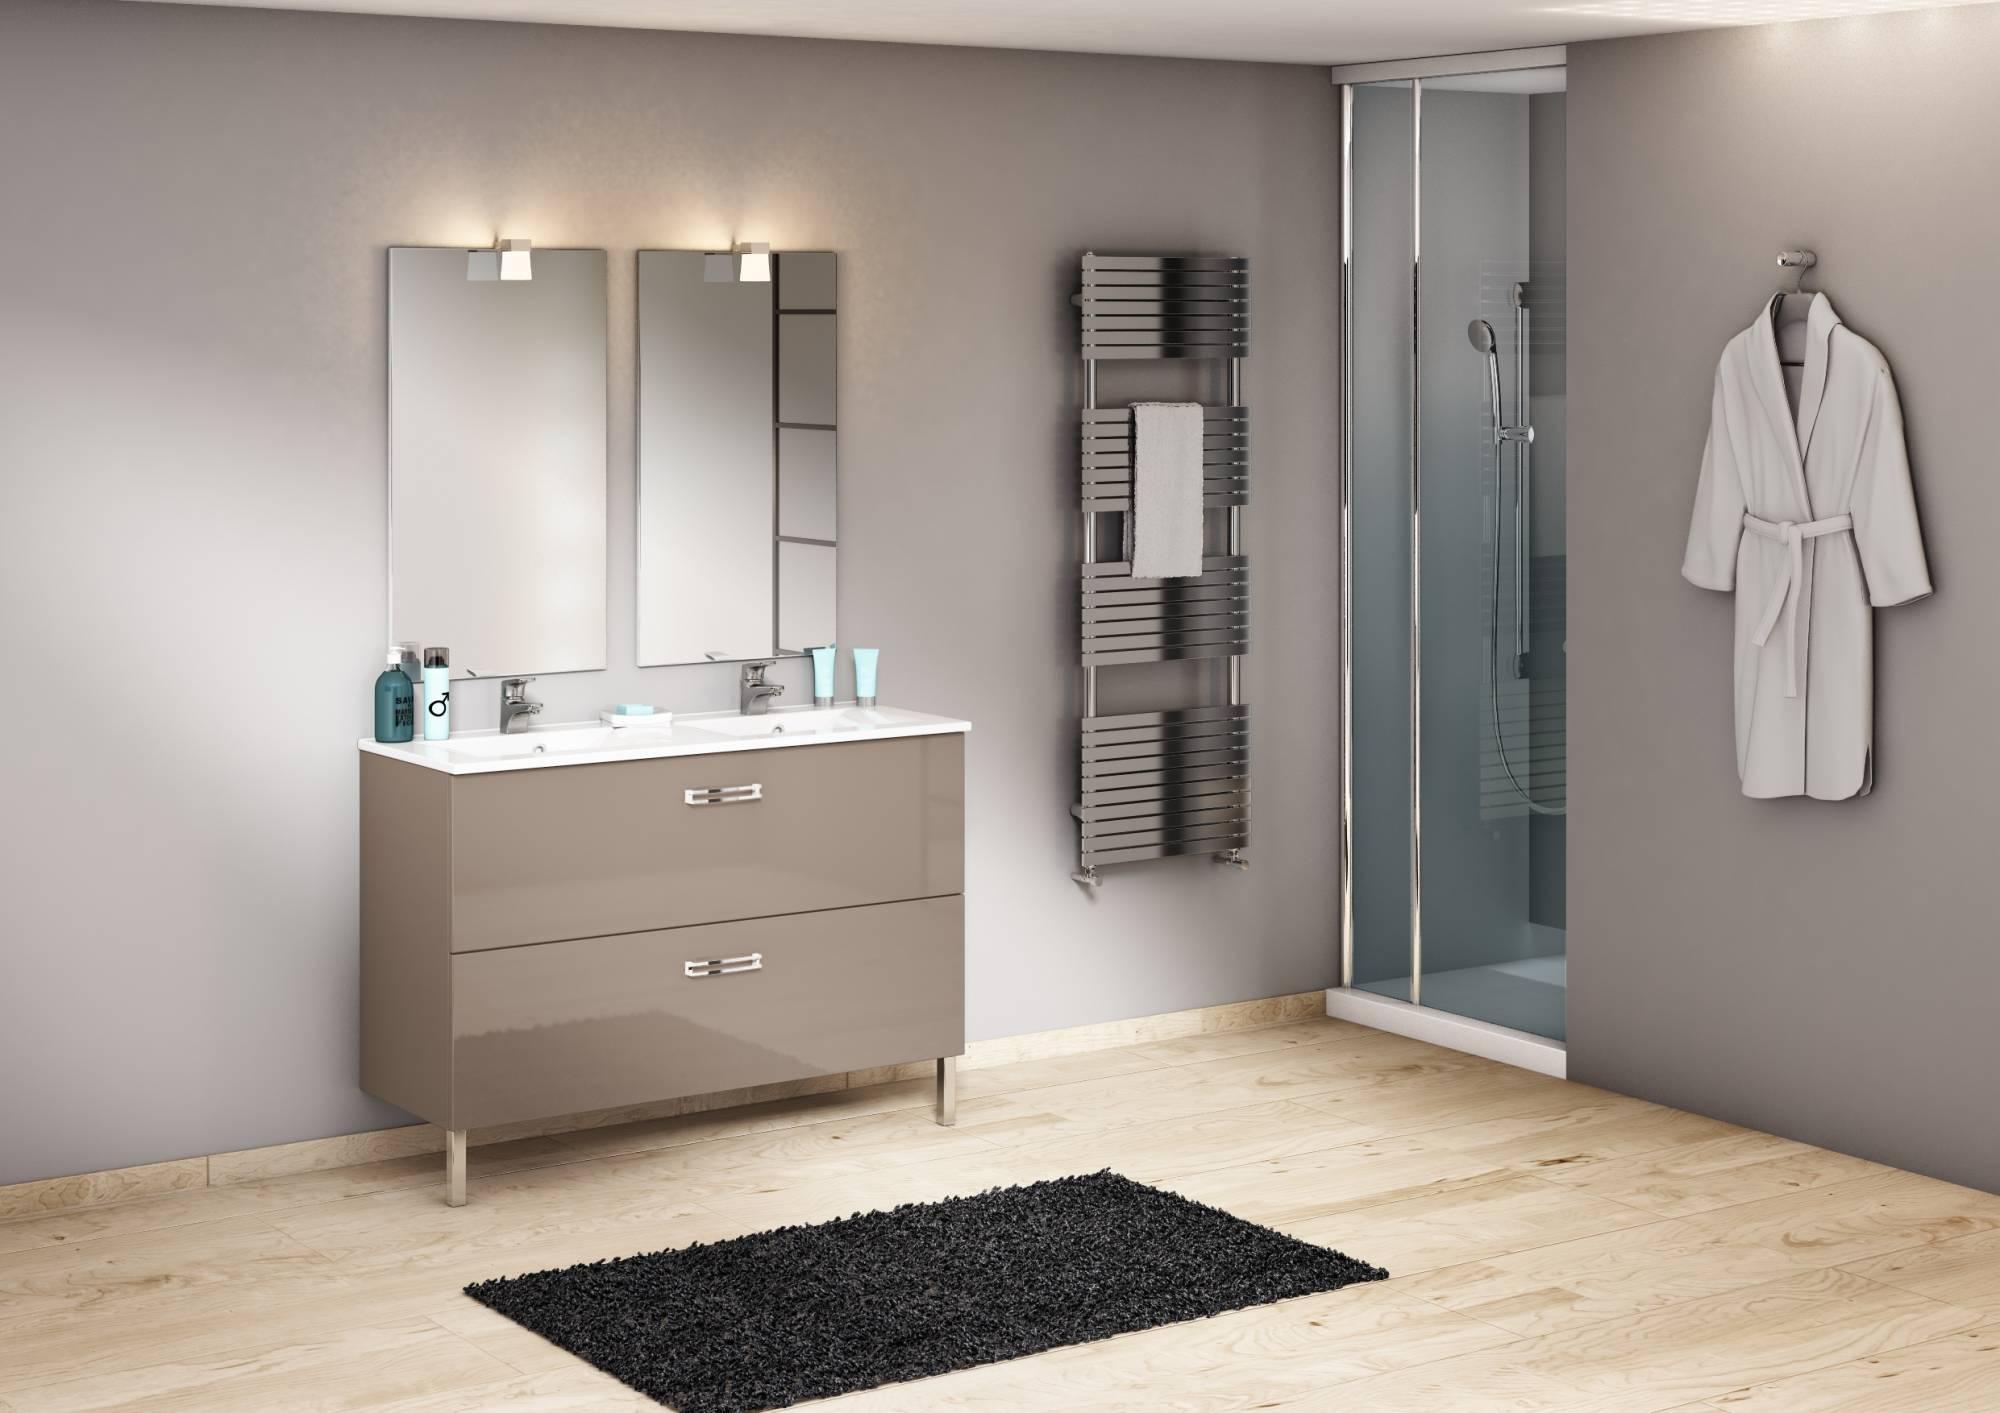 Salle De Bain Double G ~ meuble pour salle de bains chango eguilles 13510 carrelage